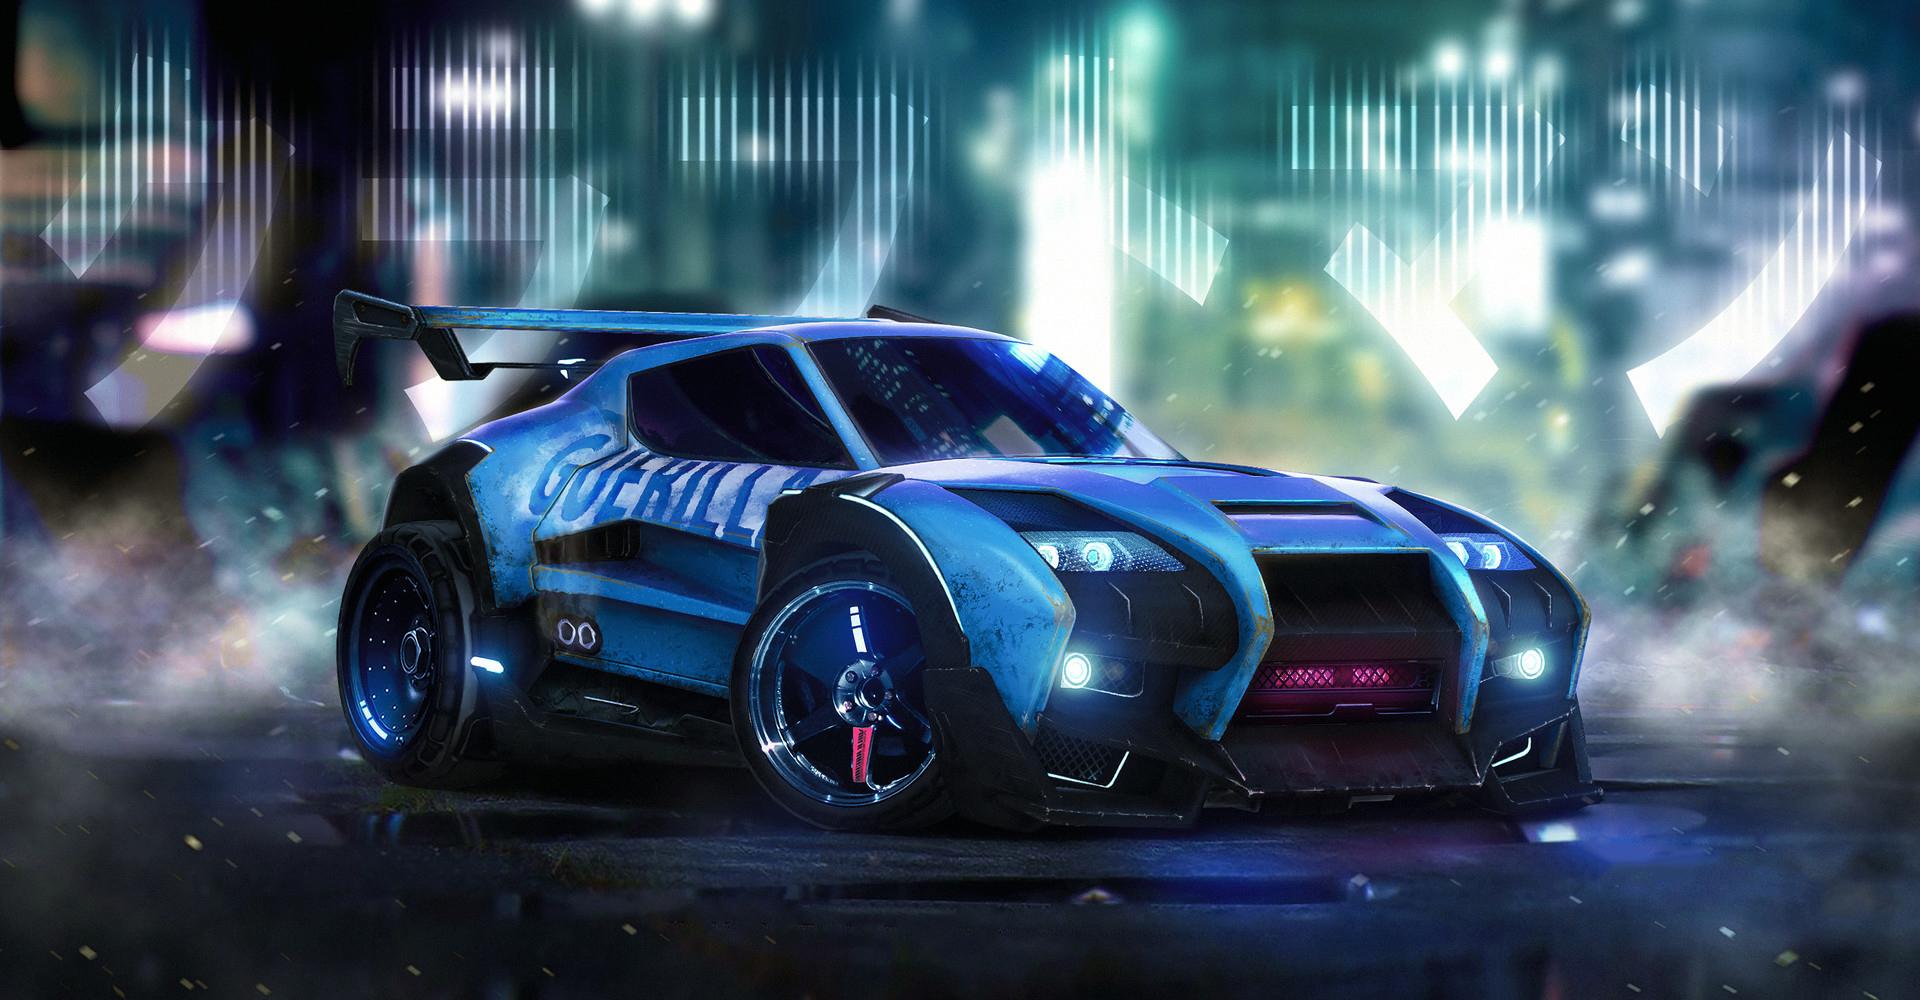 Rocket League Car Artwork Hd Games 4k Wallpapers Images